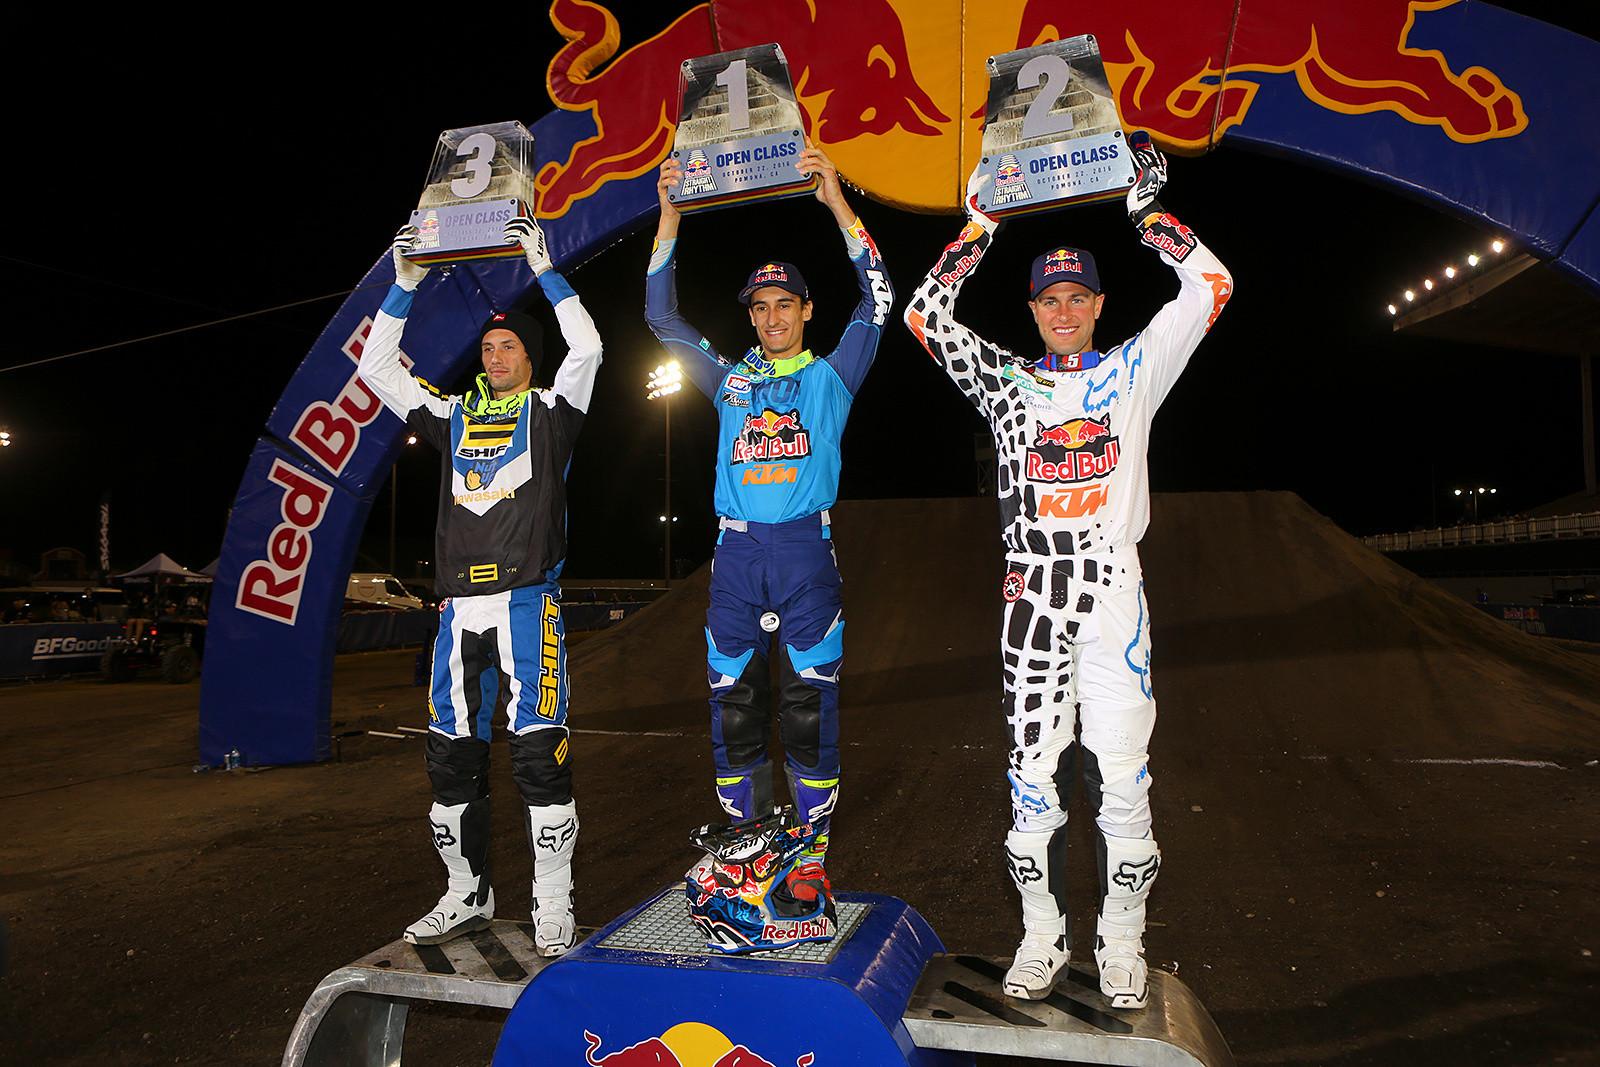 Marvin Musquin (1st), Ryan Dungey (2nd), and Josh Hansen (3rd) - Photo Blast: Red Bull Straight Rhythm - Motocross Pictures - Vital MX